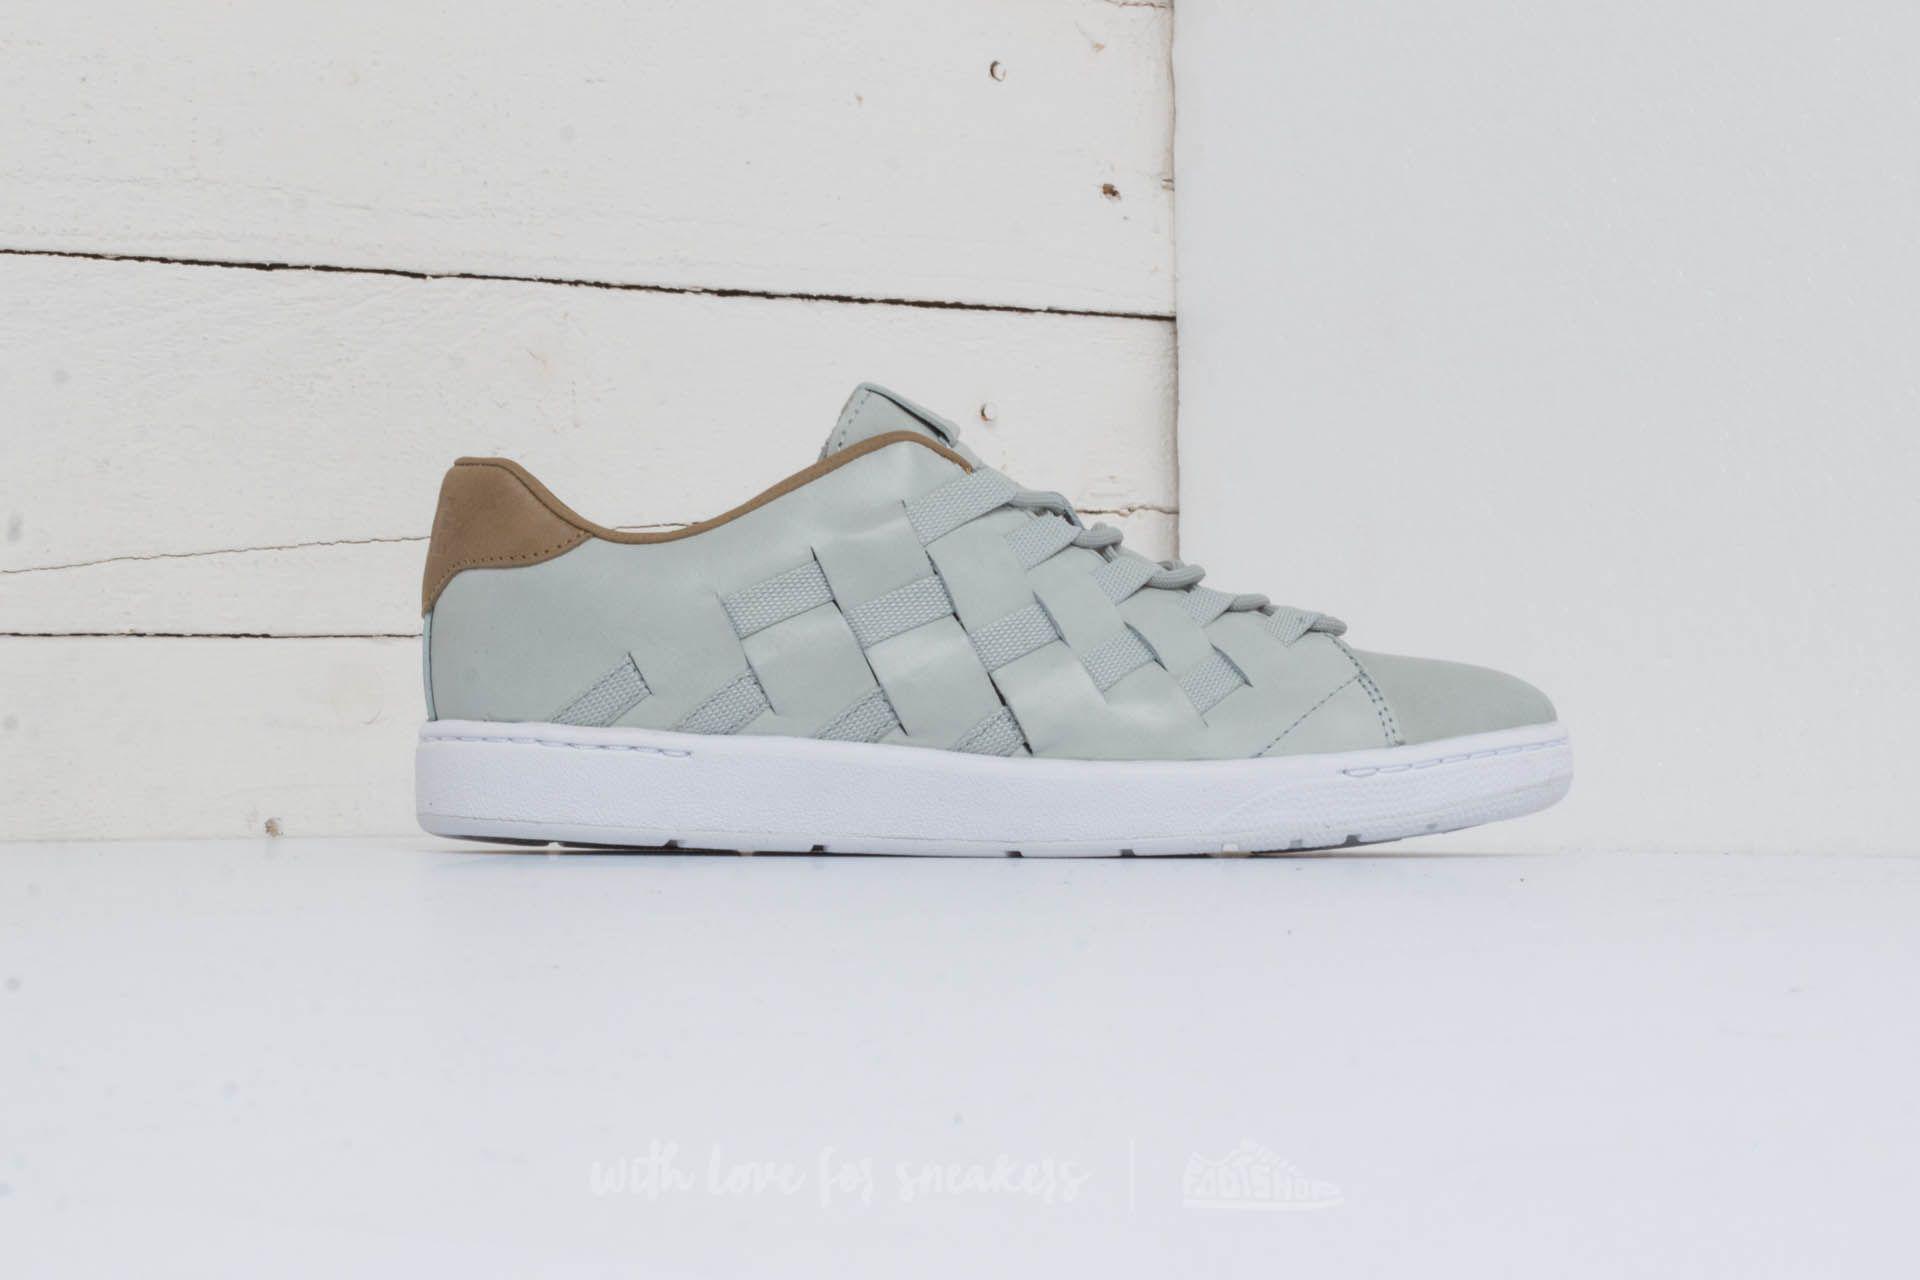 Nike Tennis Classic Ultra Premium QS 'Woven Pack' Light Silver/ Light Silver-Hyper-White Almacenista Geniue XdQRzmqby